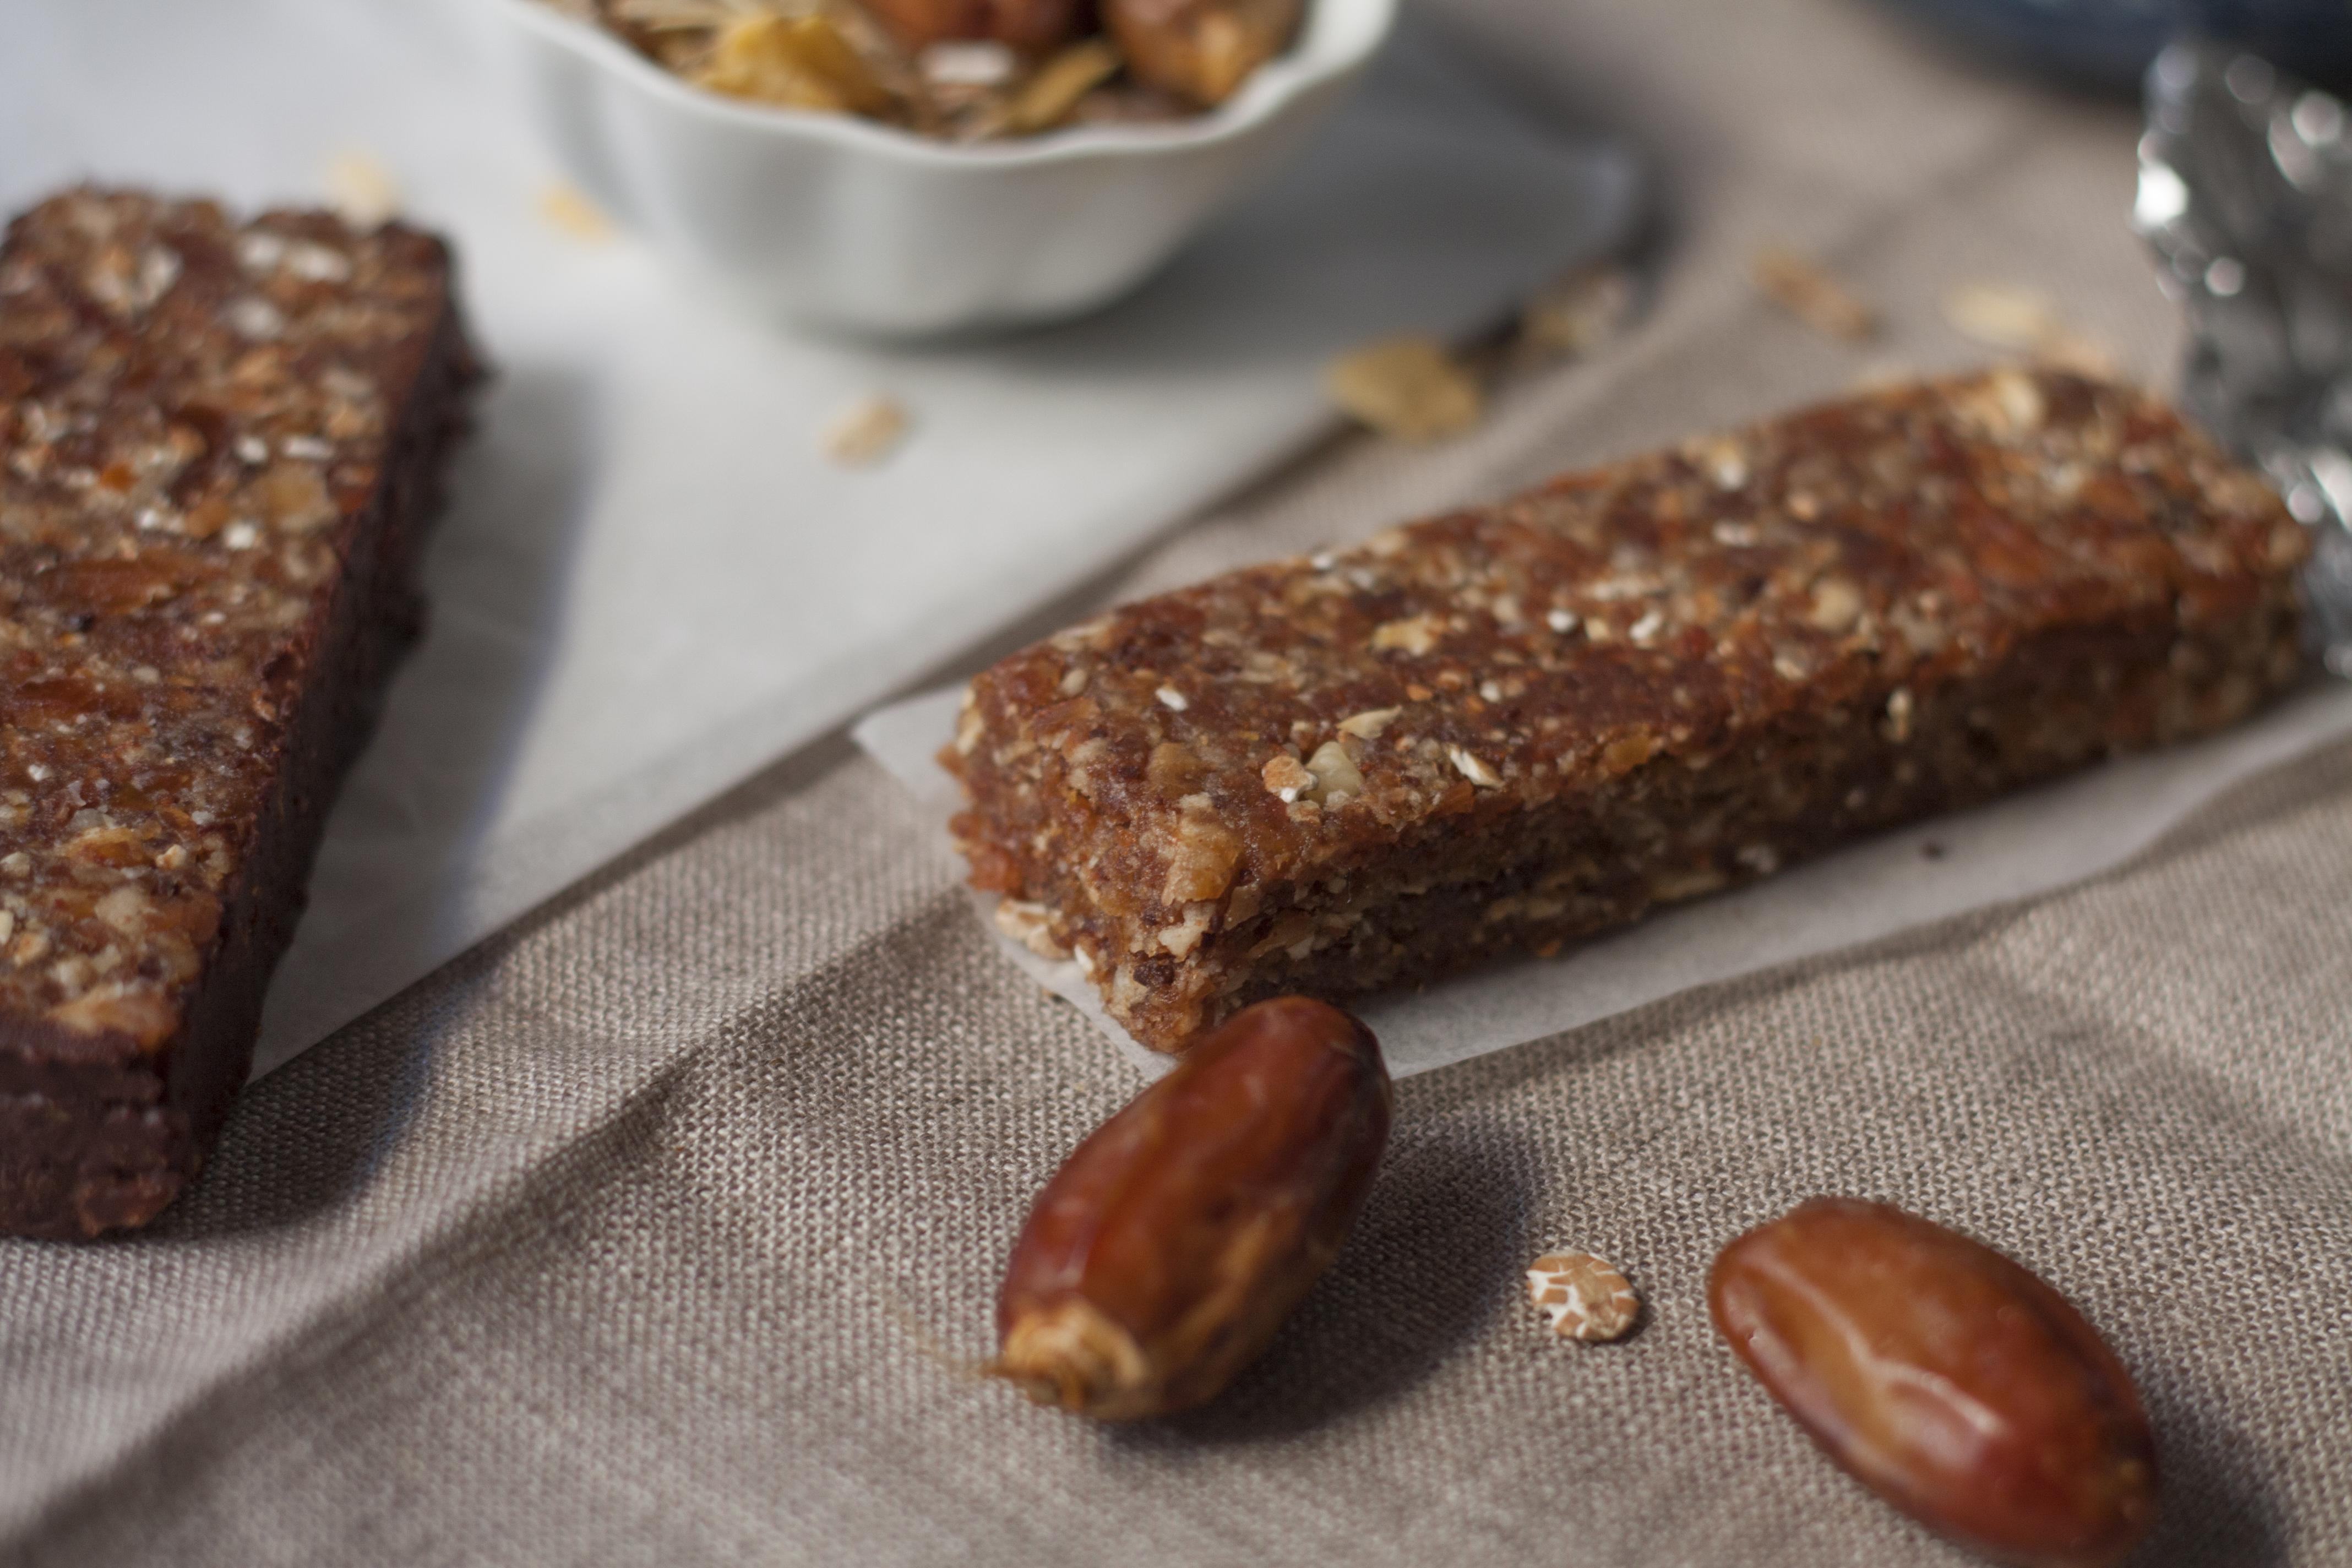 la-cuchara-azul-barritas-cereales-muesli-chocolate